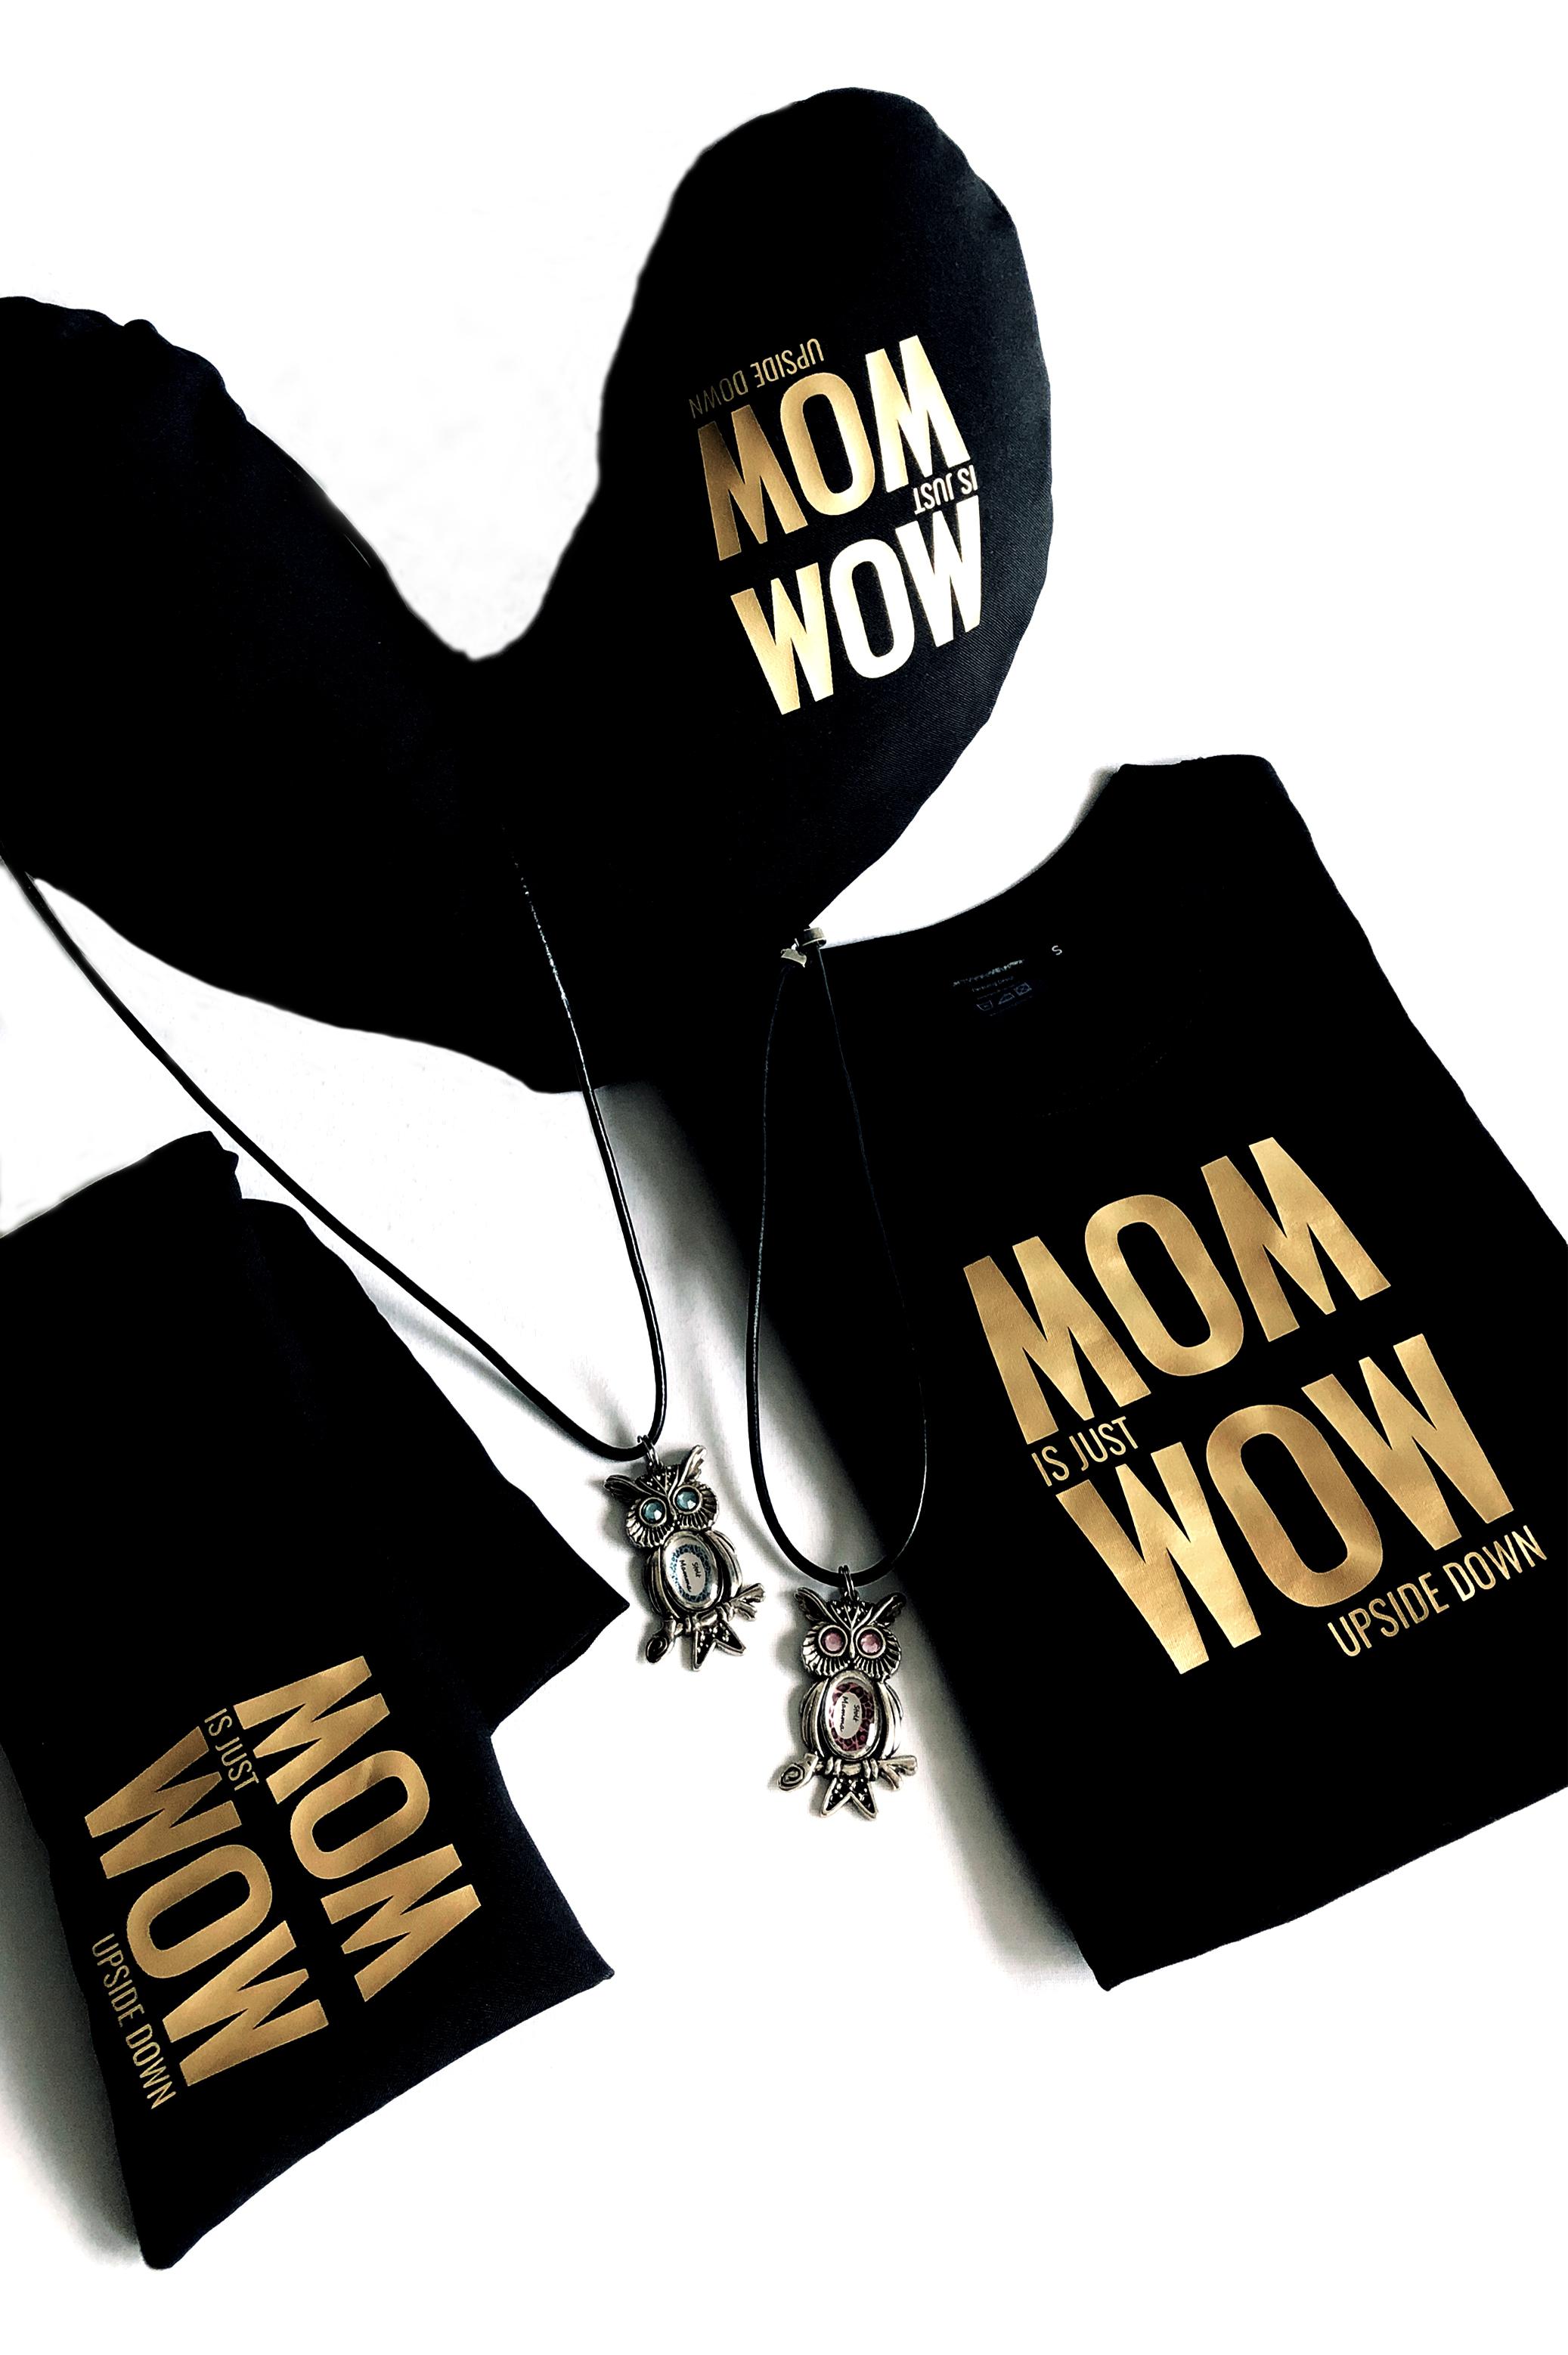 Nackkudde till mamma - MOM is just WOW